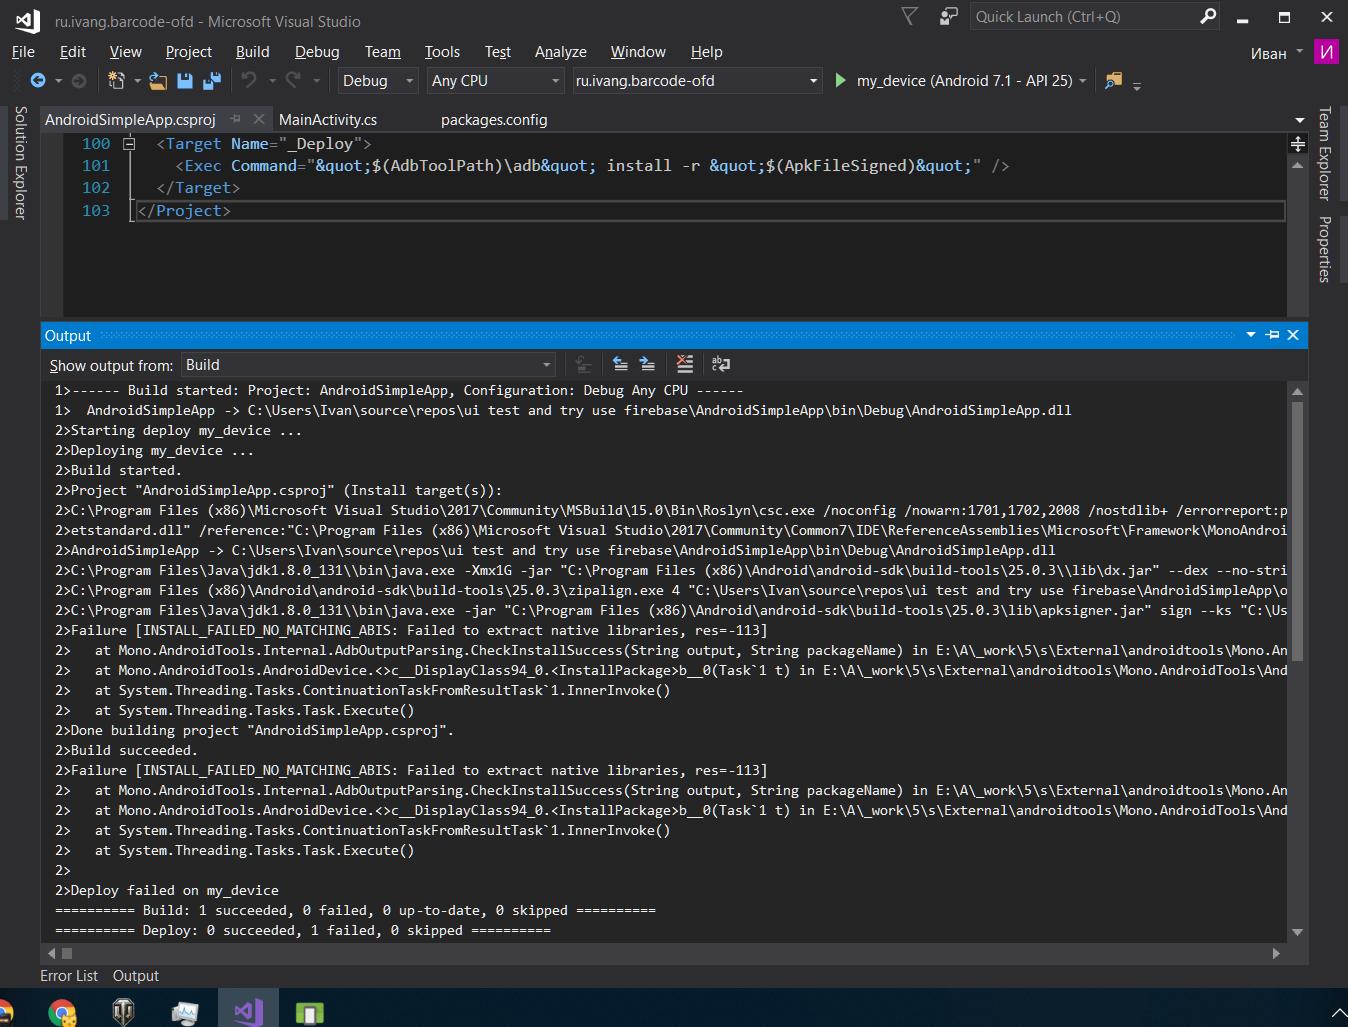 Deployment failures throw instead of declaring an Error + ErrorCode